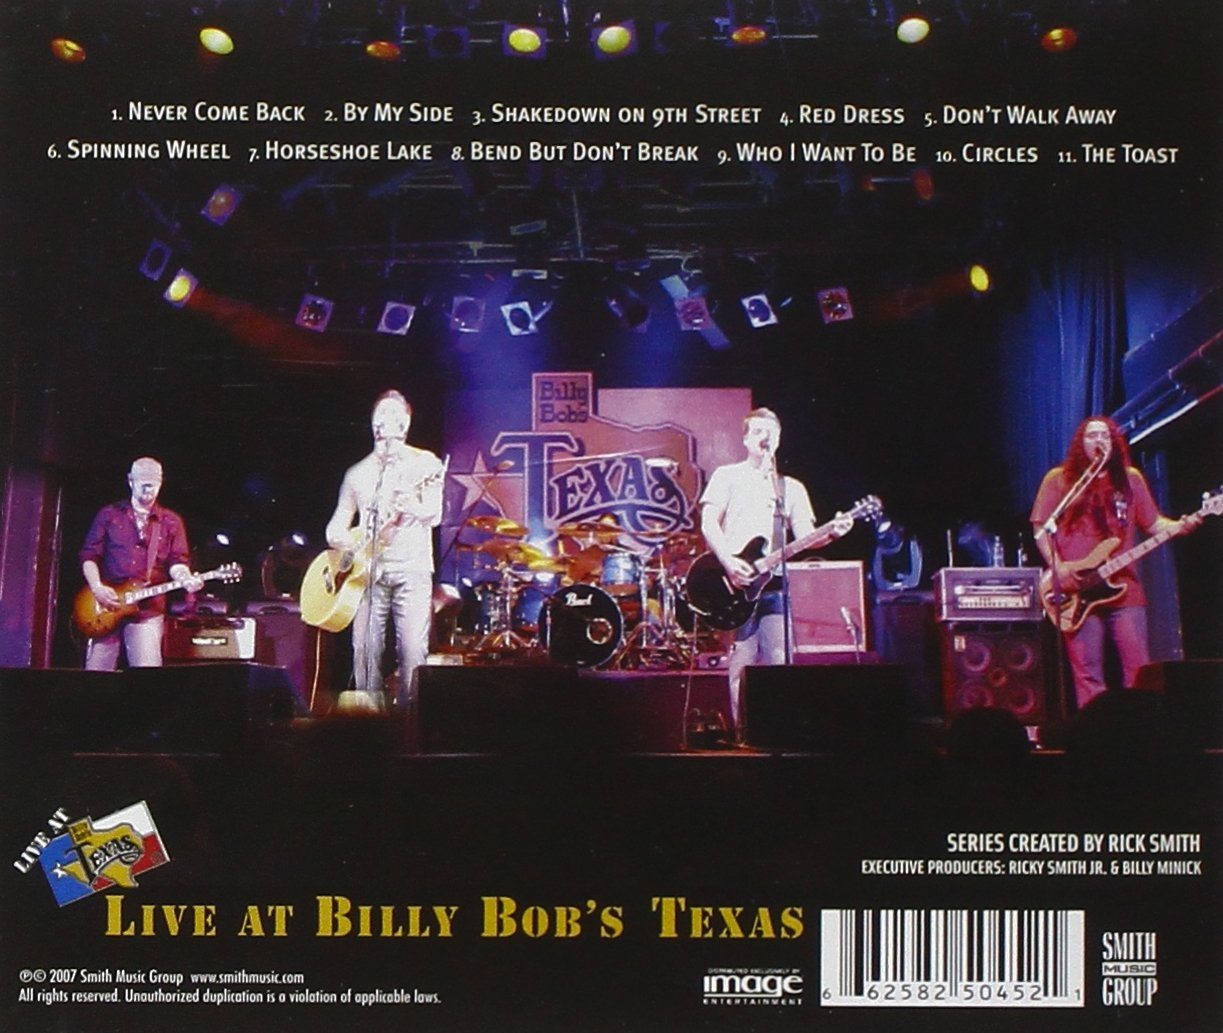 No Justice: Live at Billy Bob's Texas